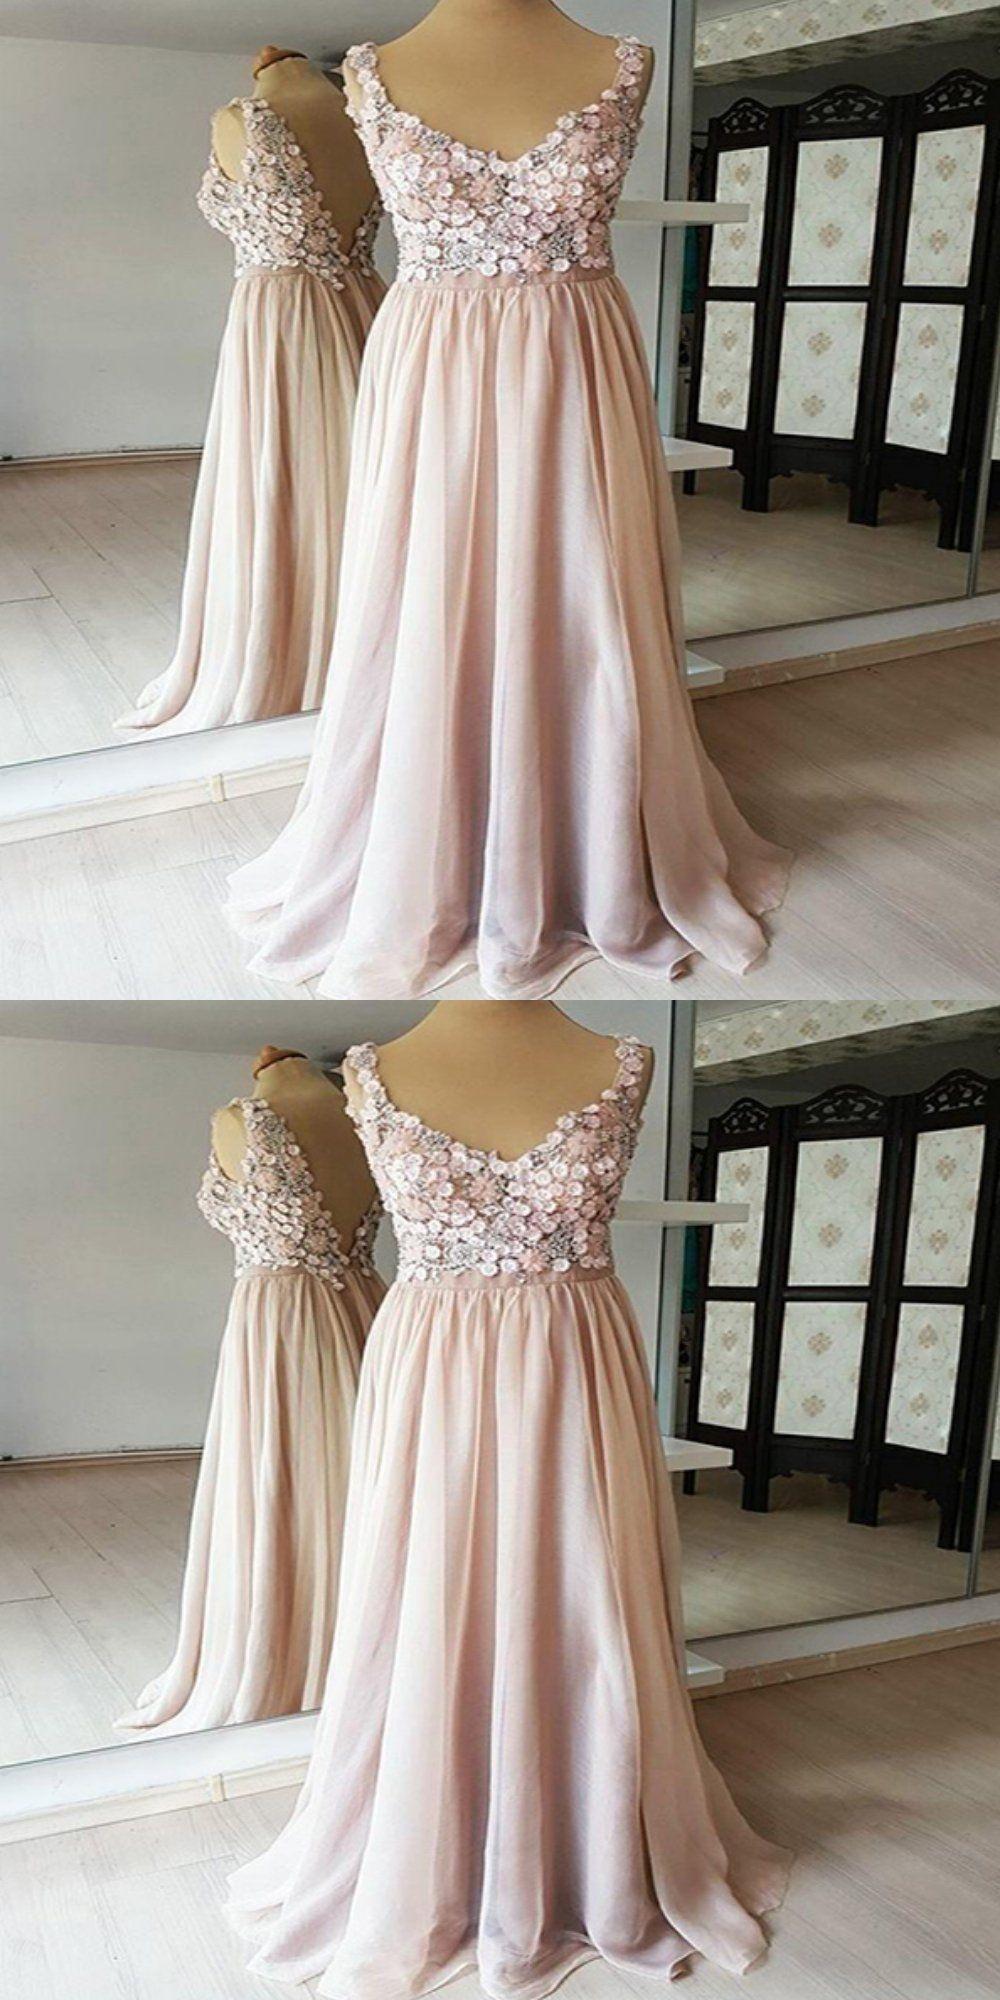 28bffd73e88 A-Line V-Neck Sleeveless Chiffon Long Prom Dresses With Appliques ...